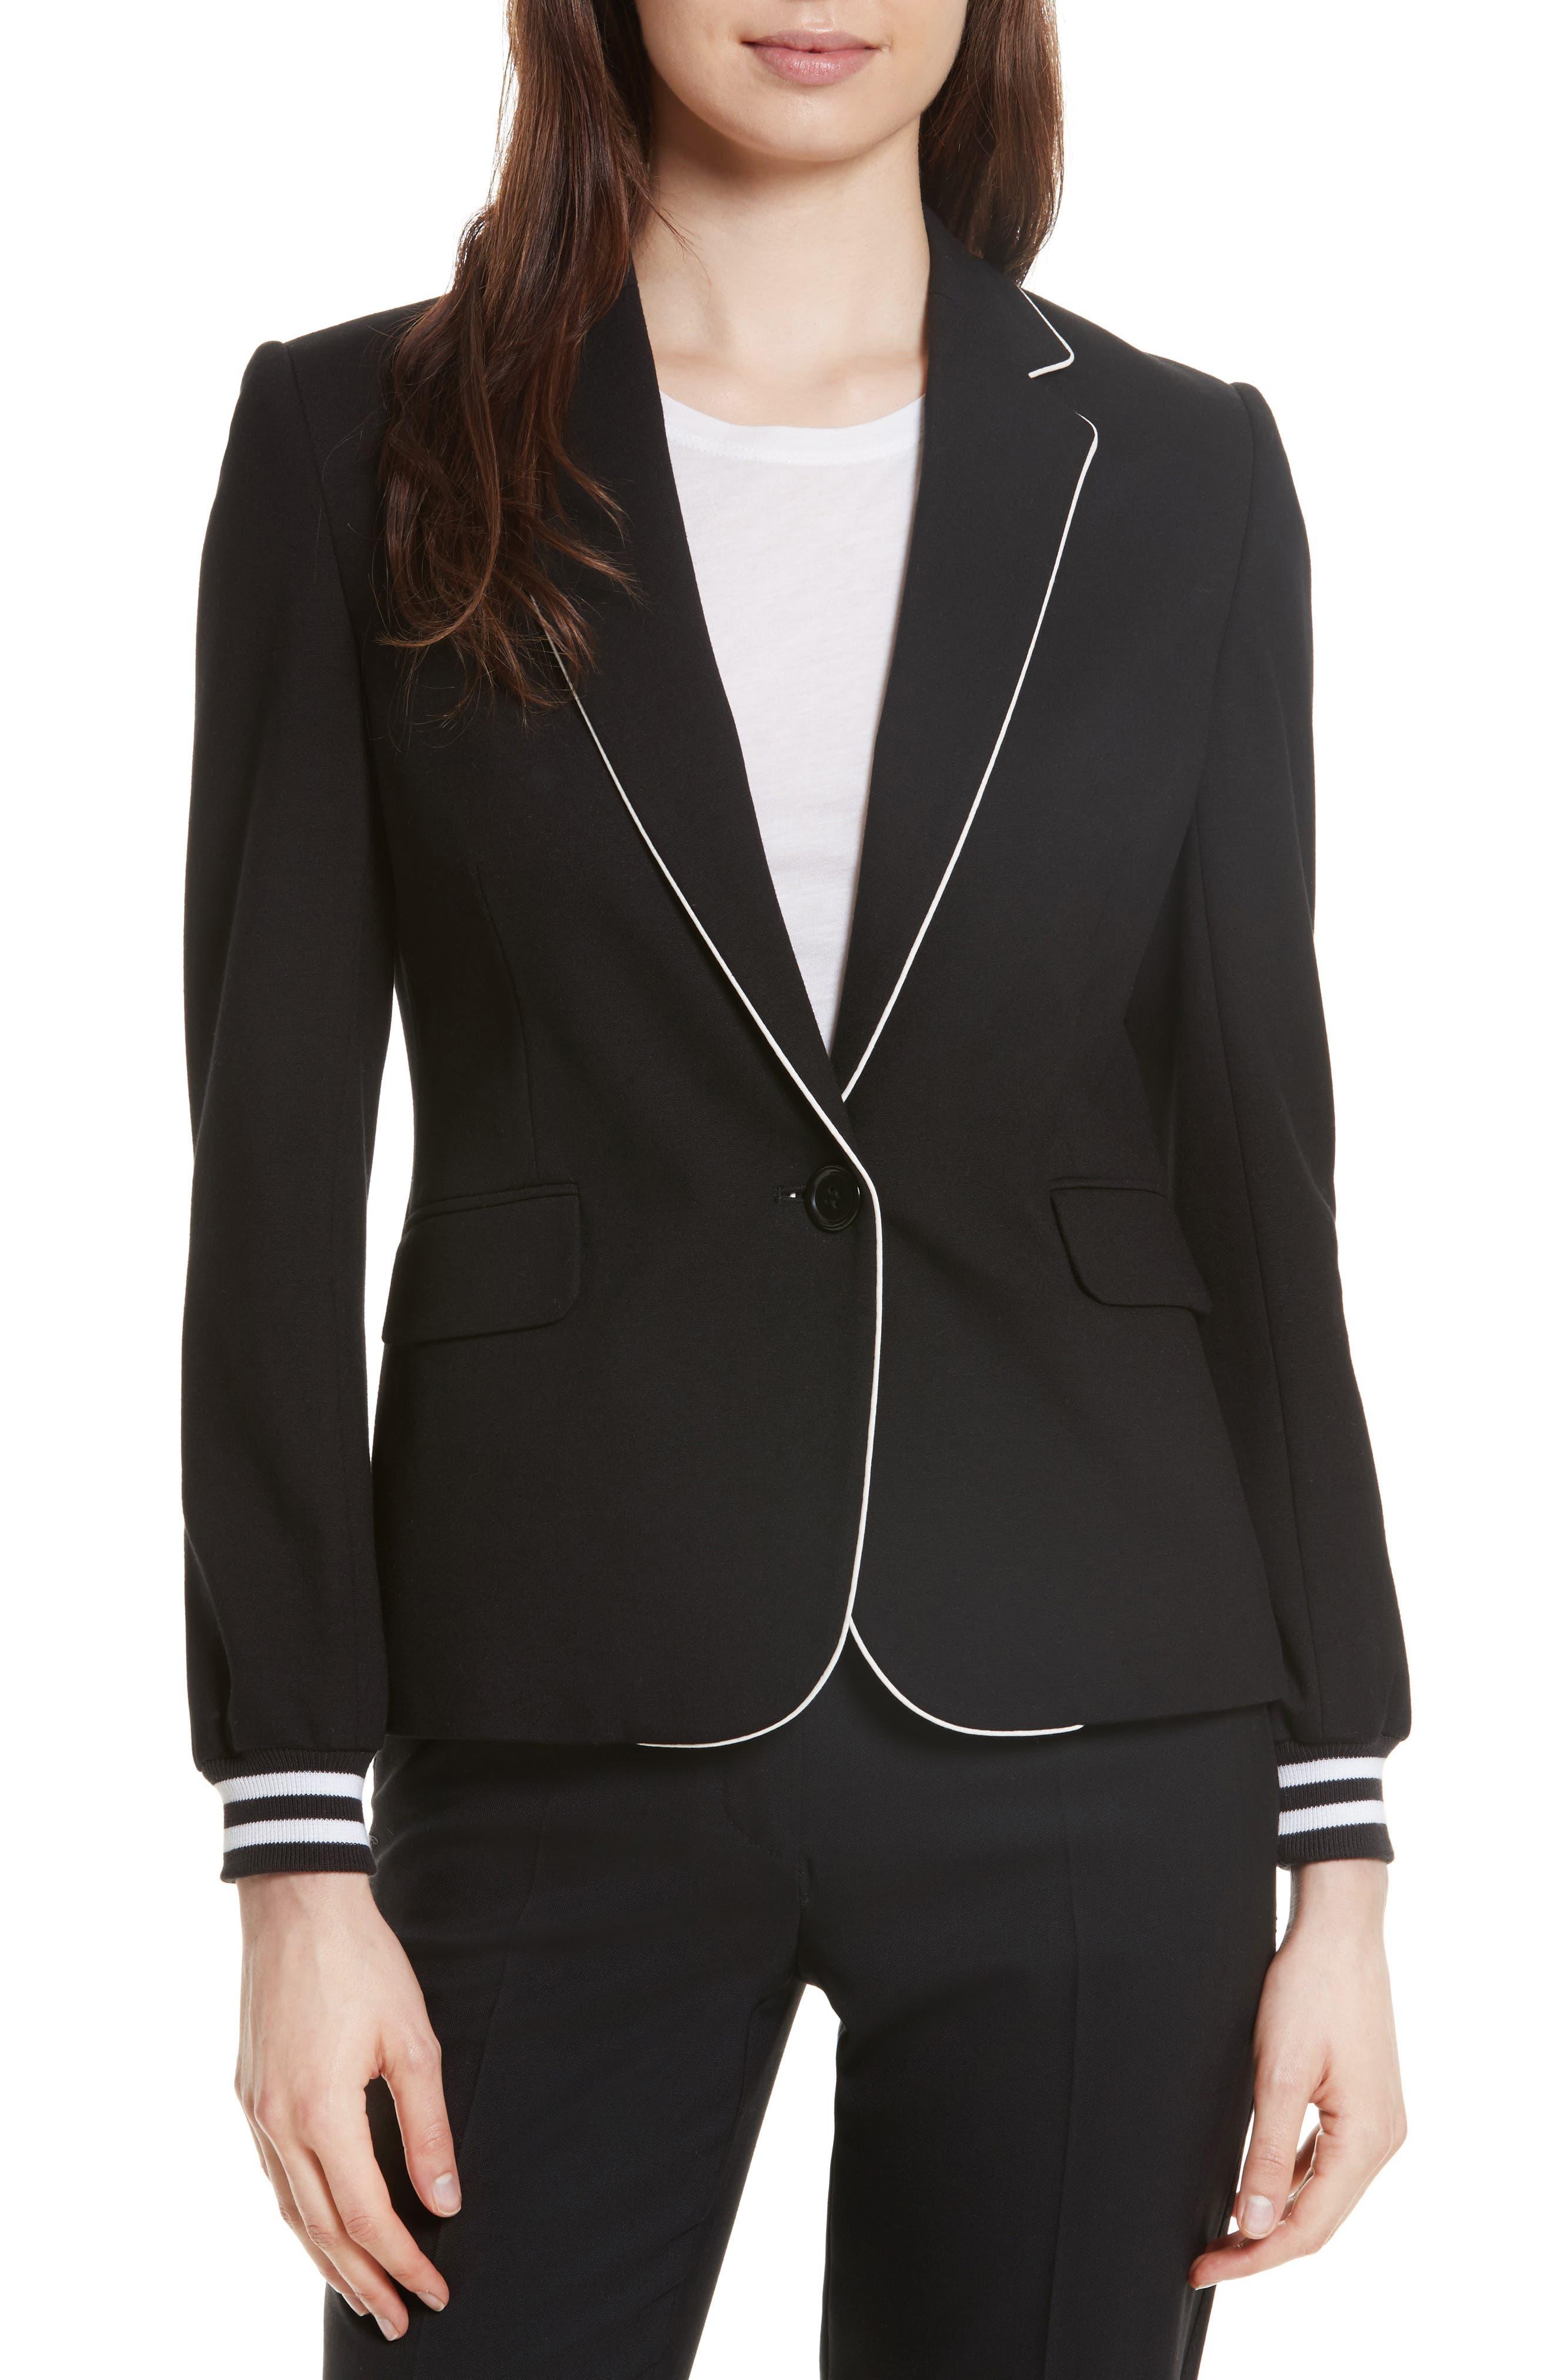 Alternate Image 1 Selected - Helene Berman Piped Jersey Blazer